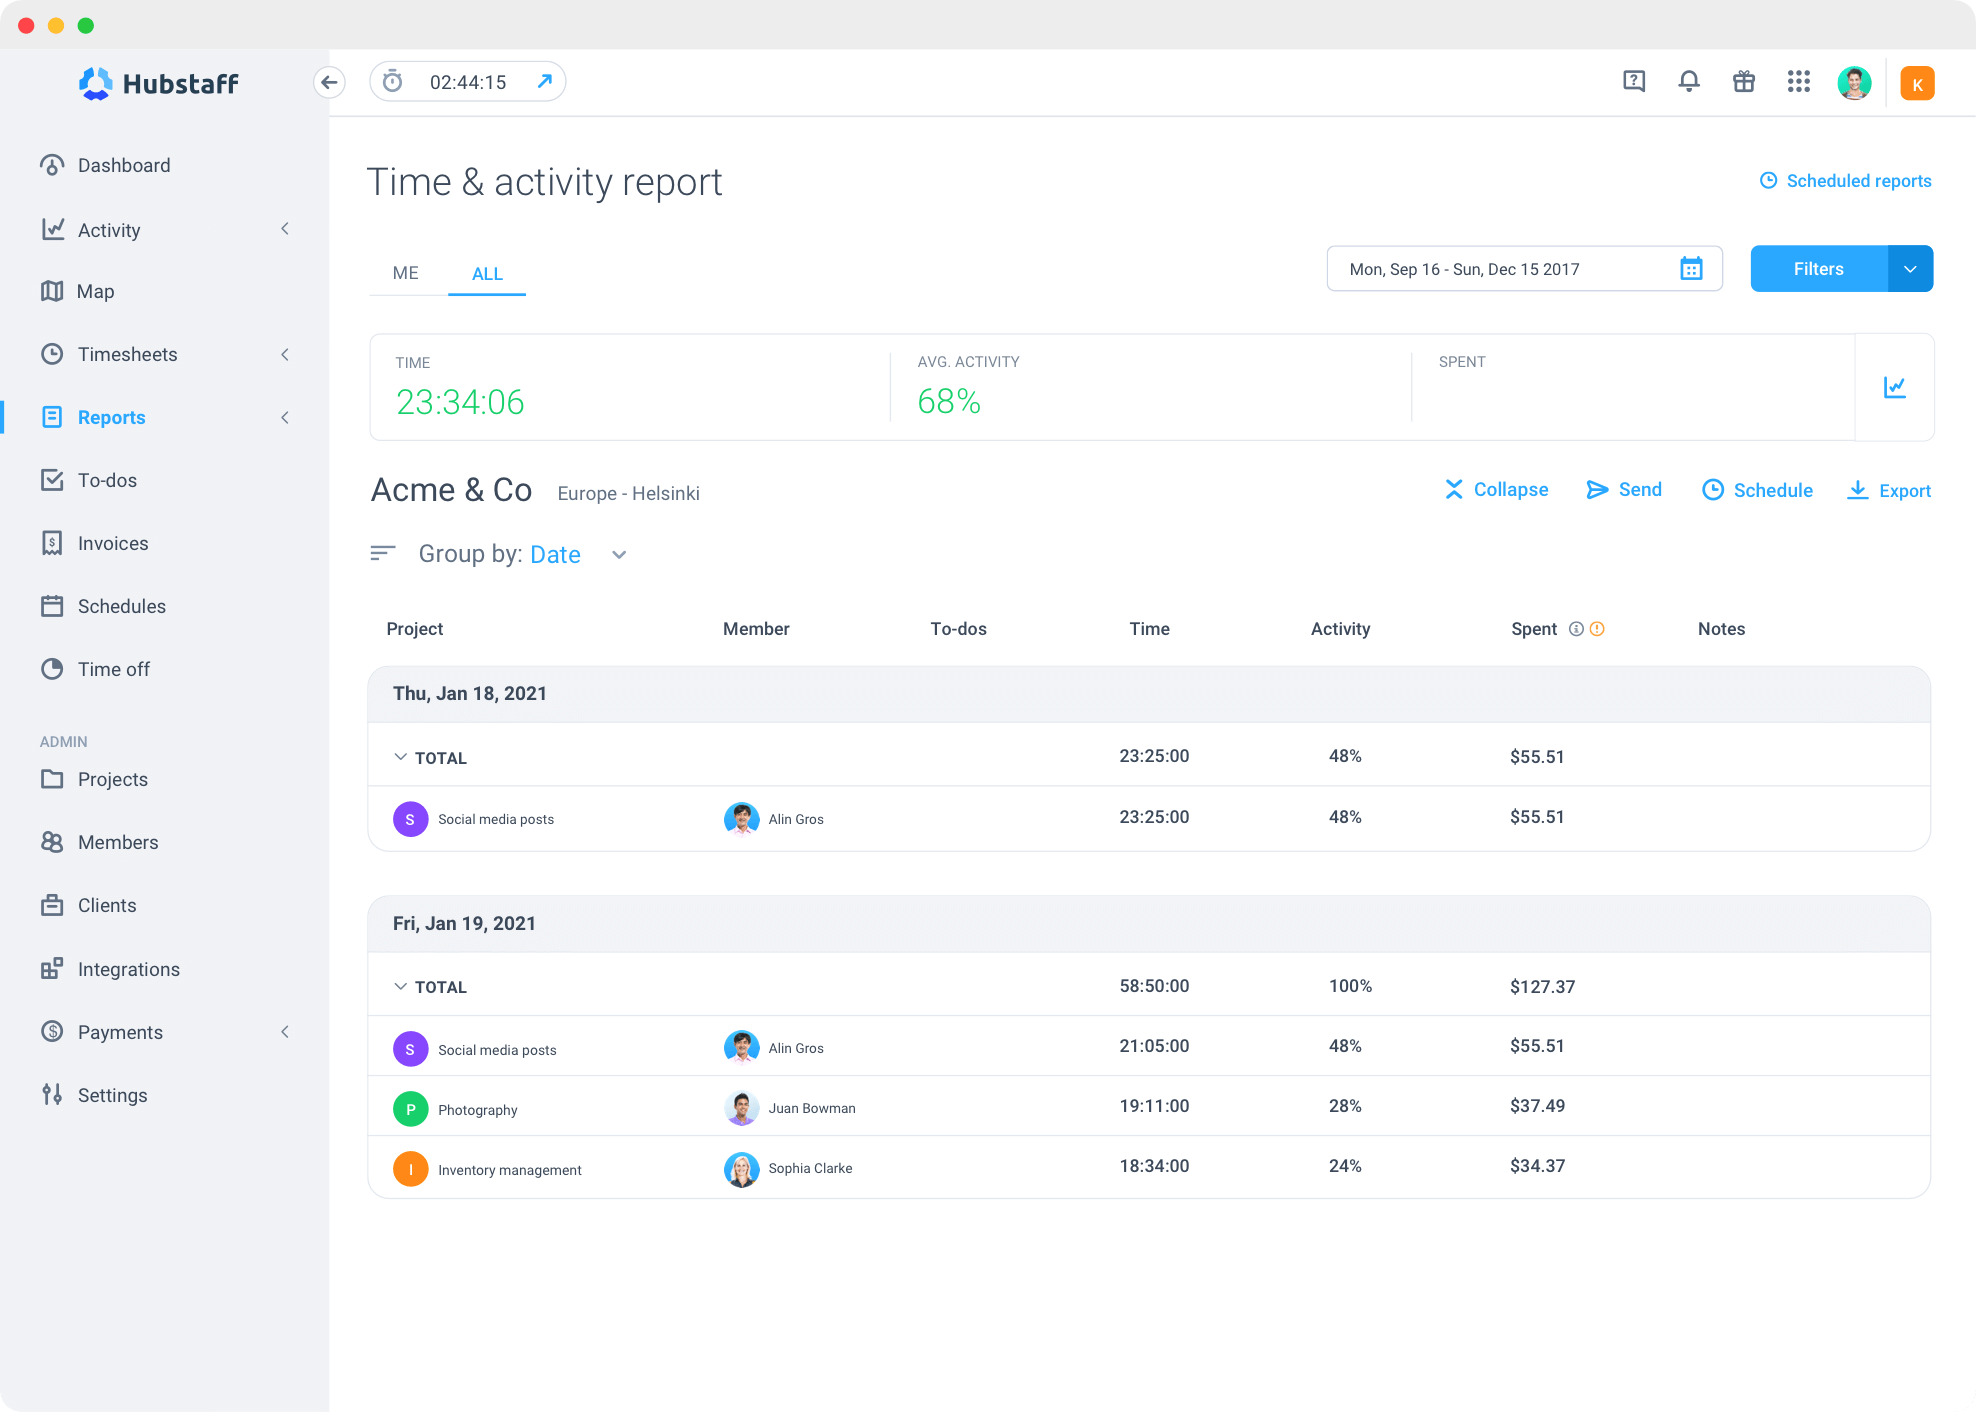 Hubstaff activity report